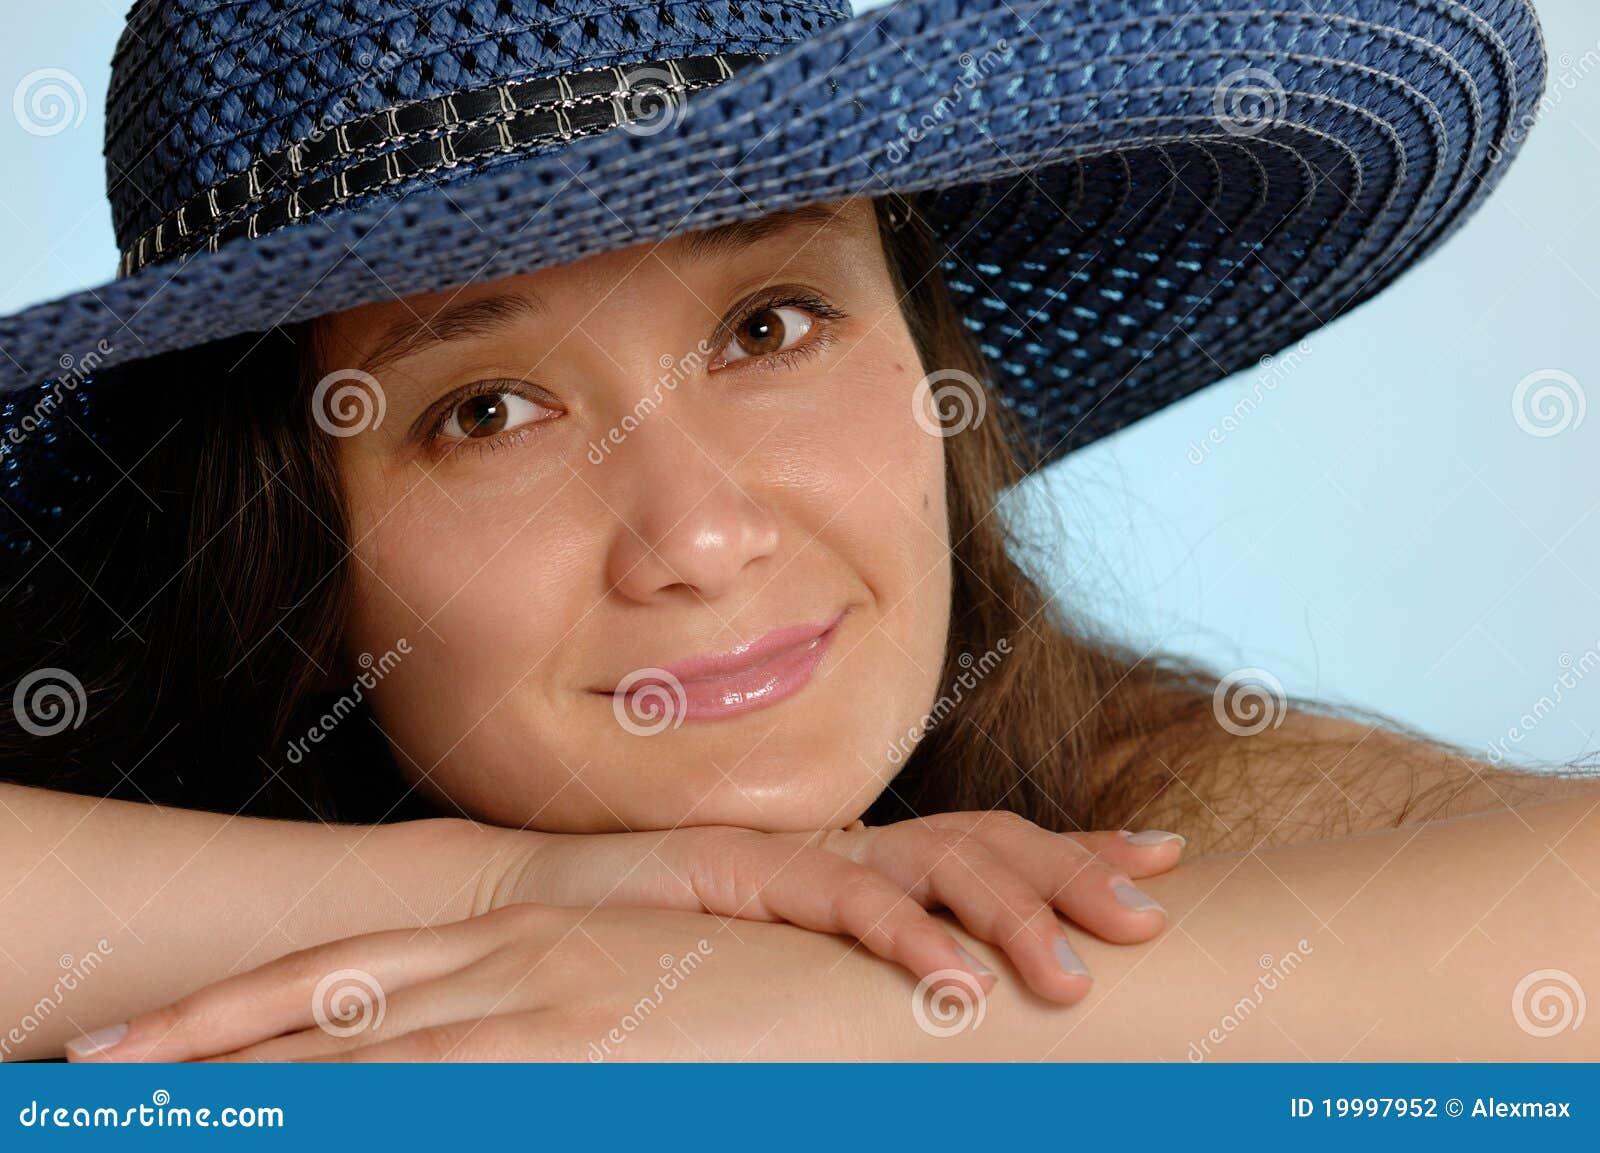 Woman in a Blue Sunhat